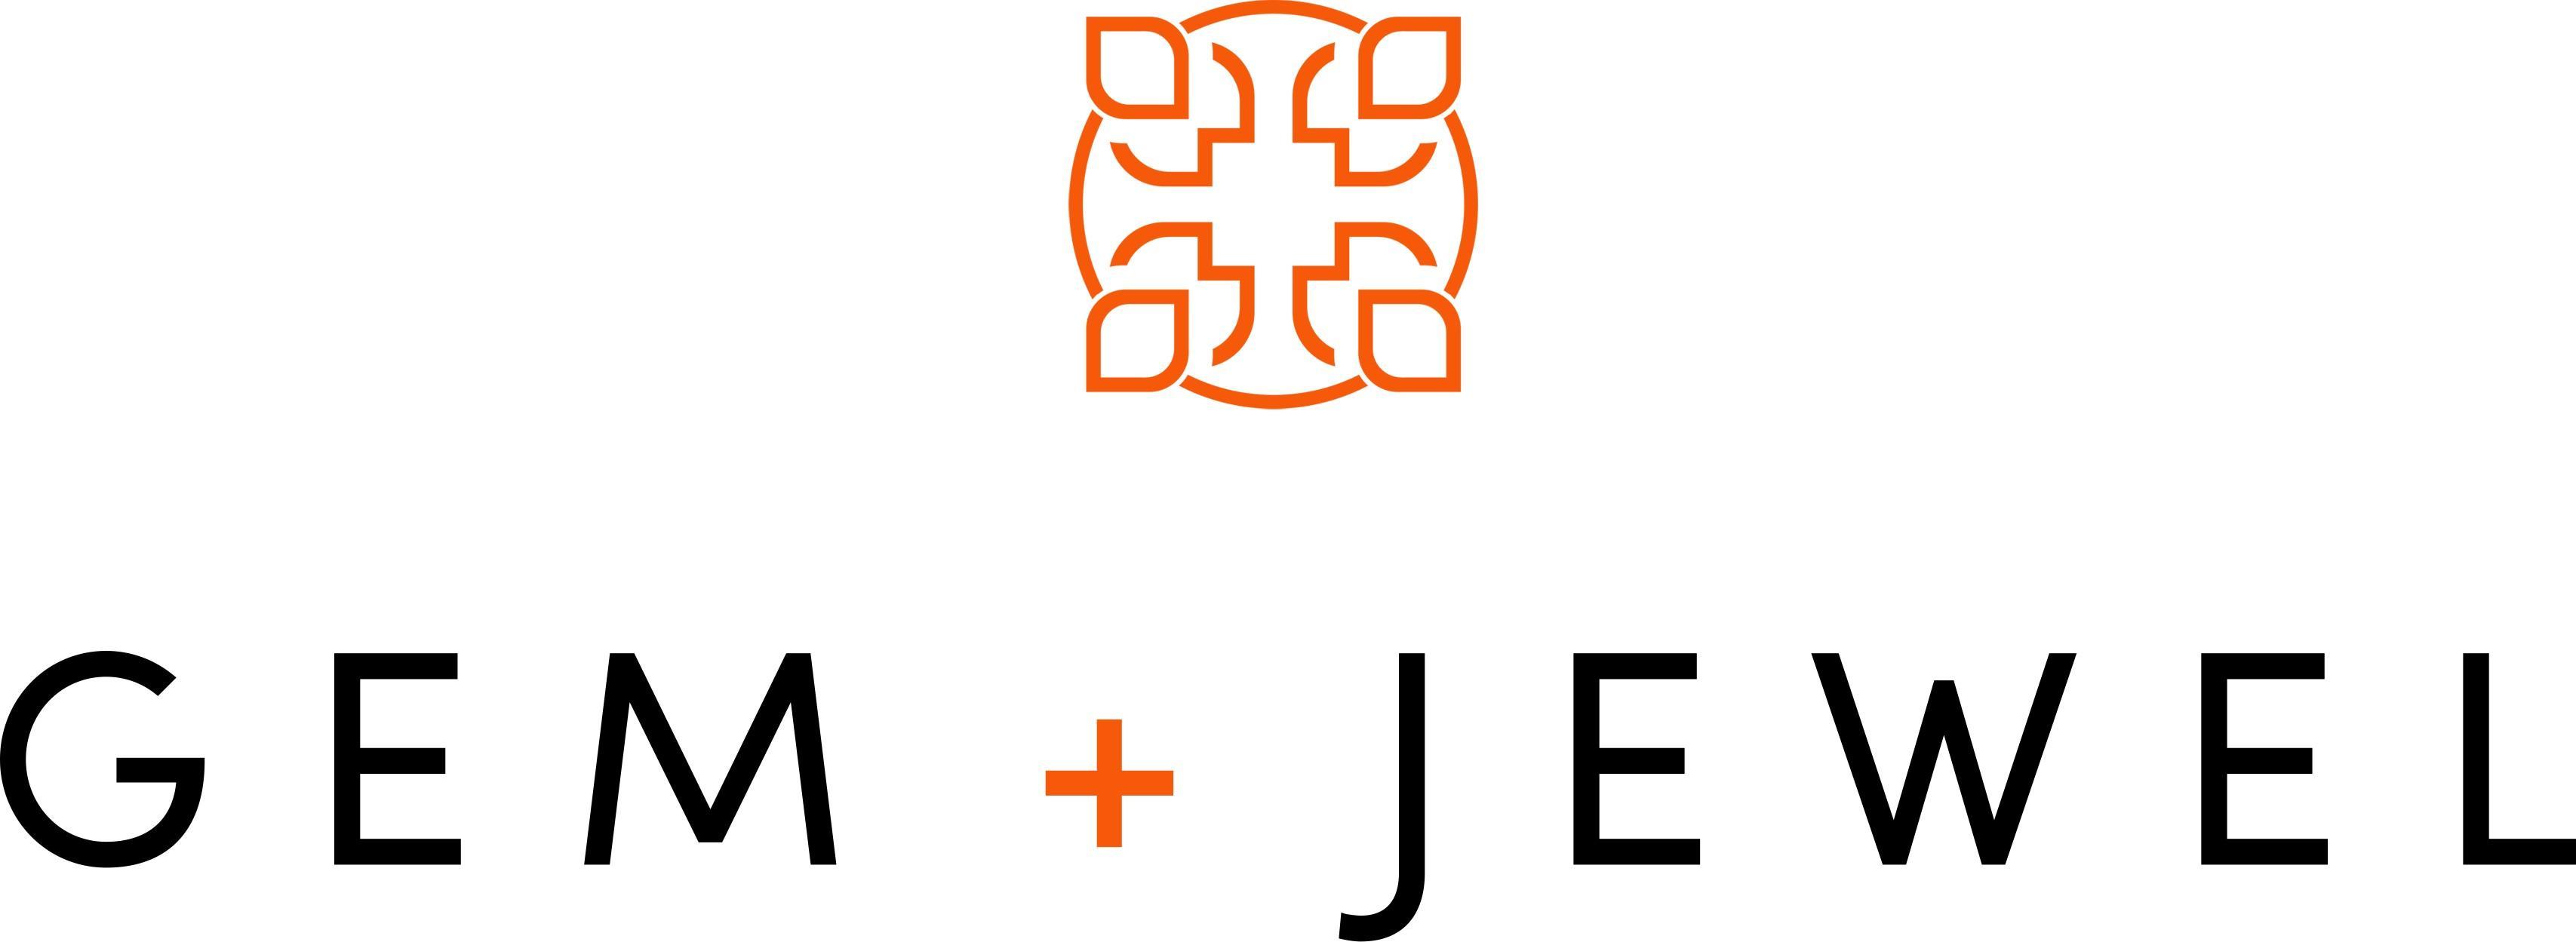 Gem + Jewel company logo